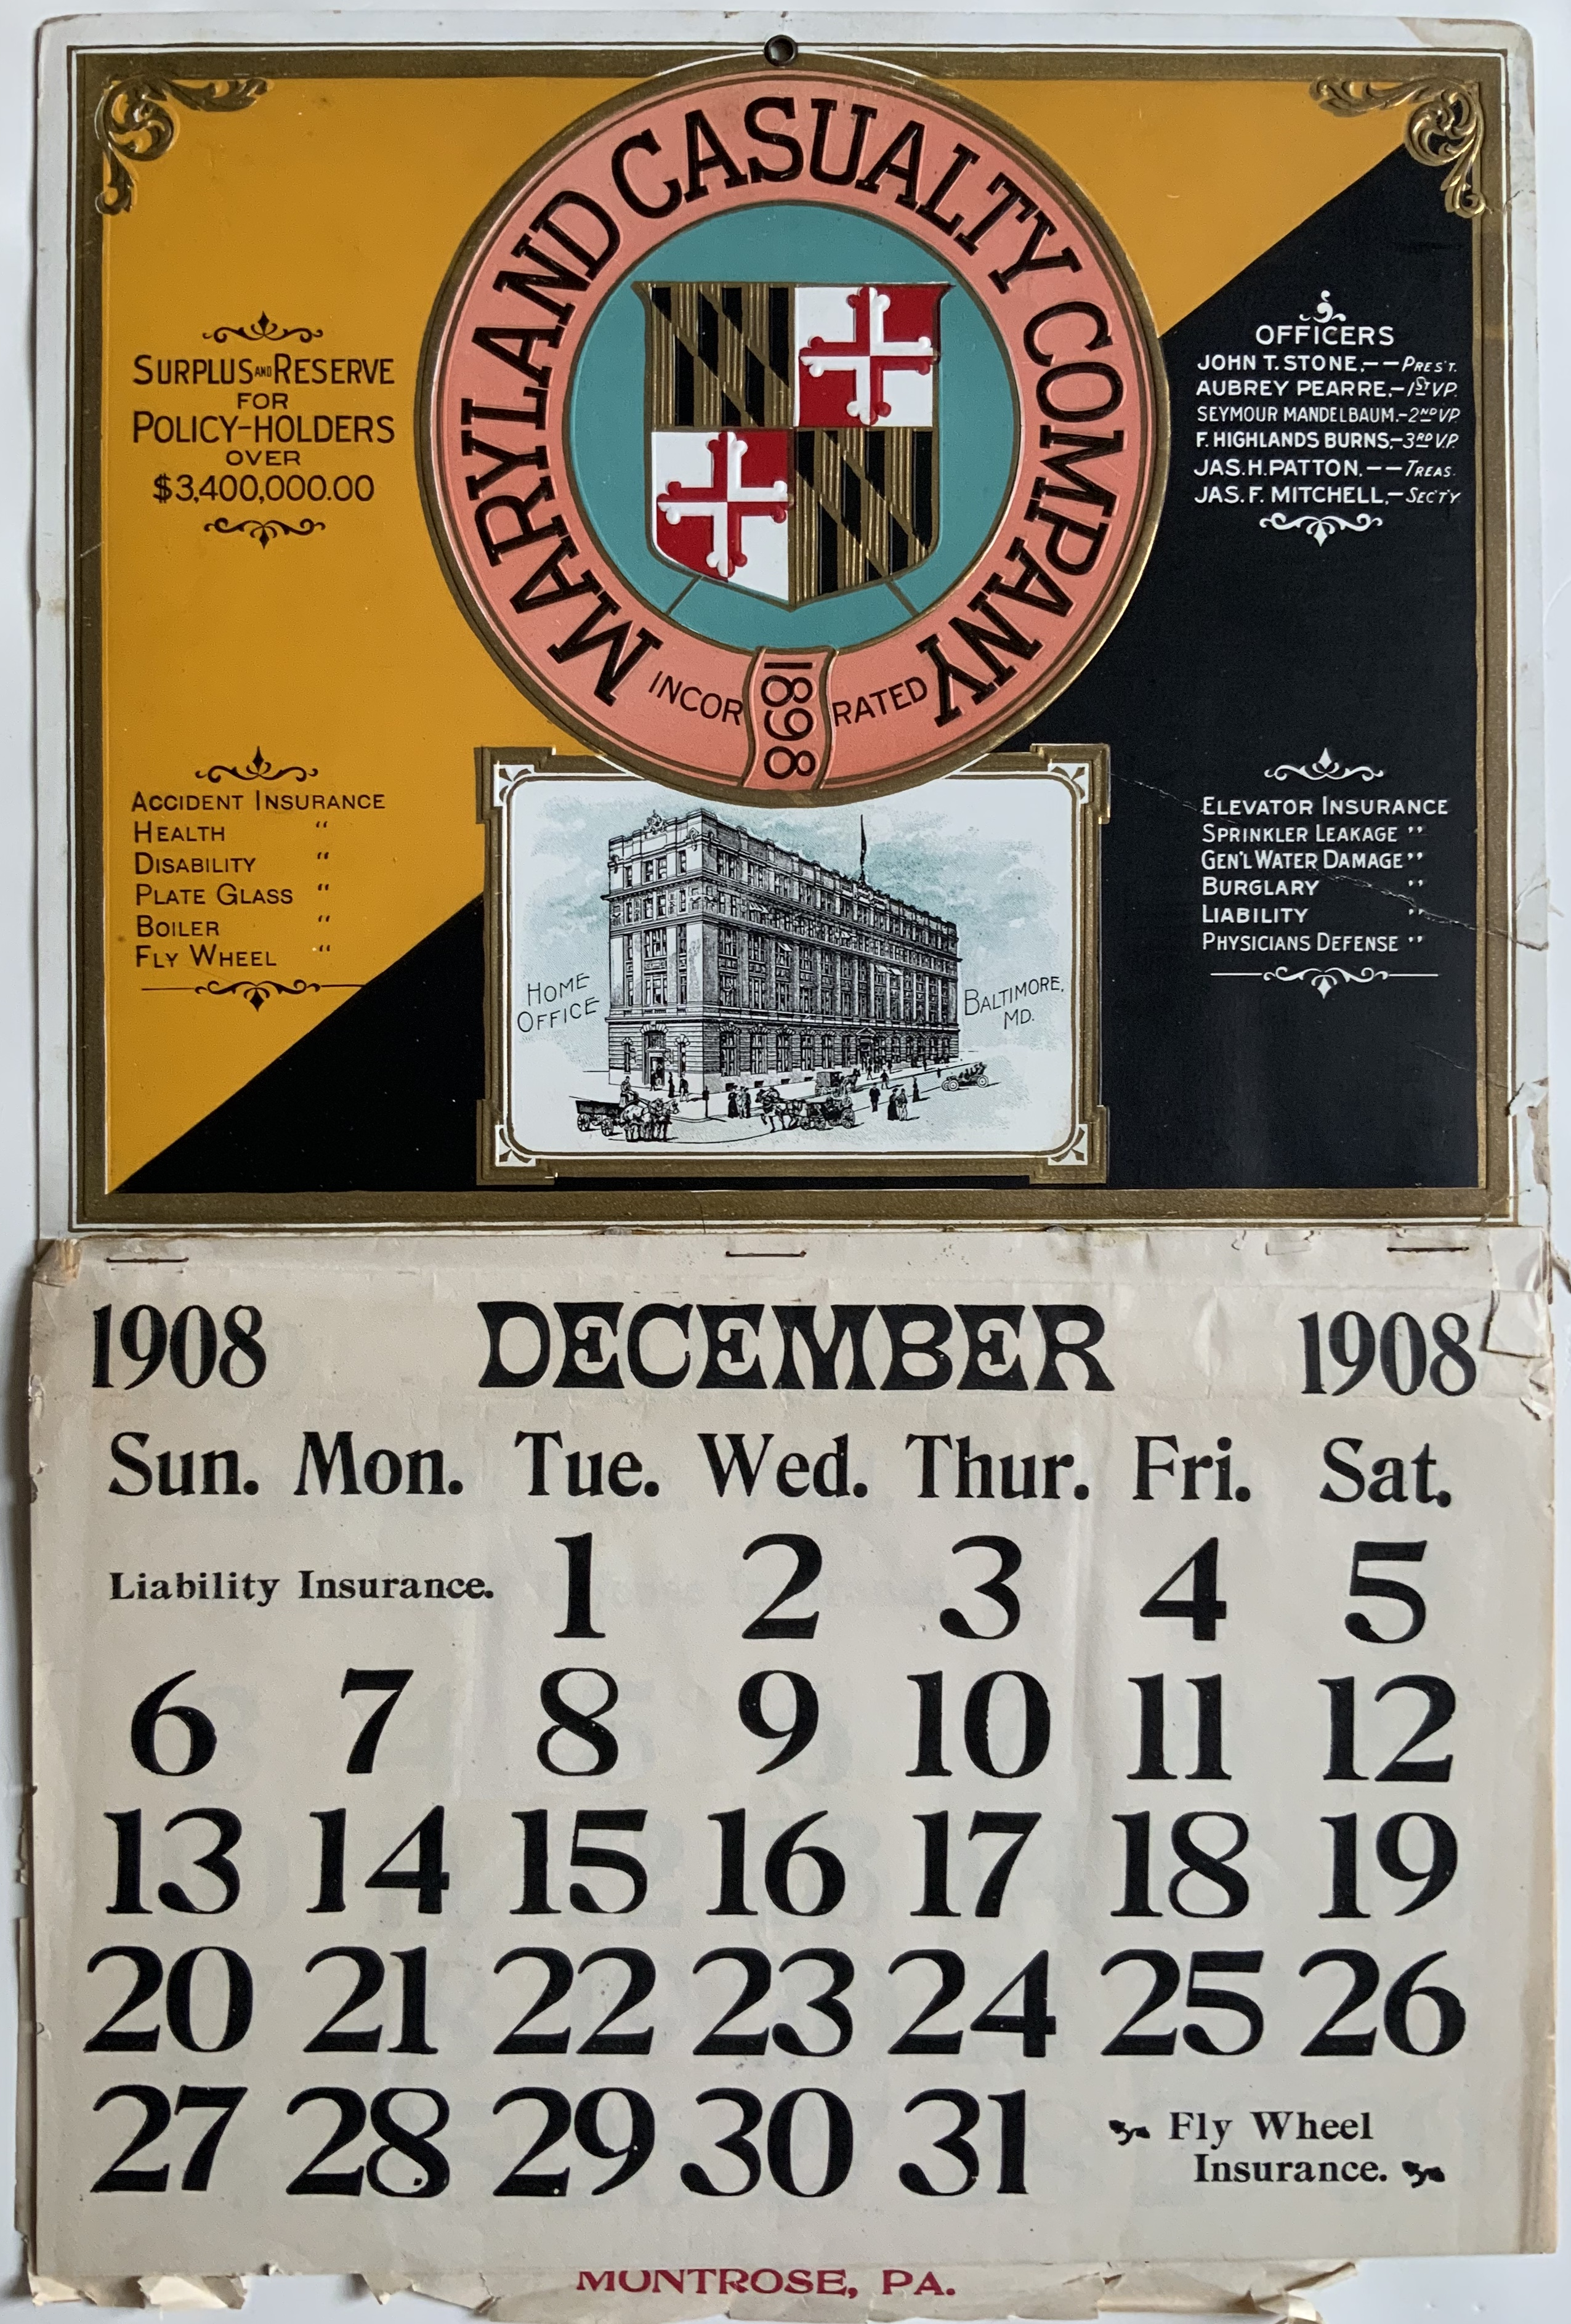 J740MARYLAND CASUALTY COMPANY INSURANCE CALENDAR 1908